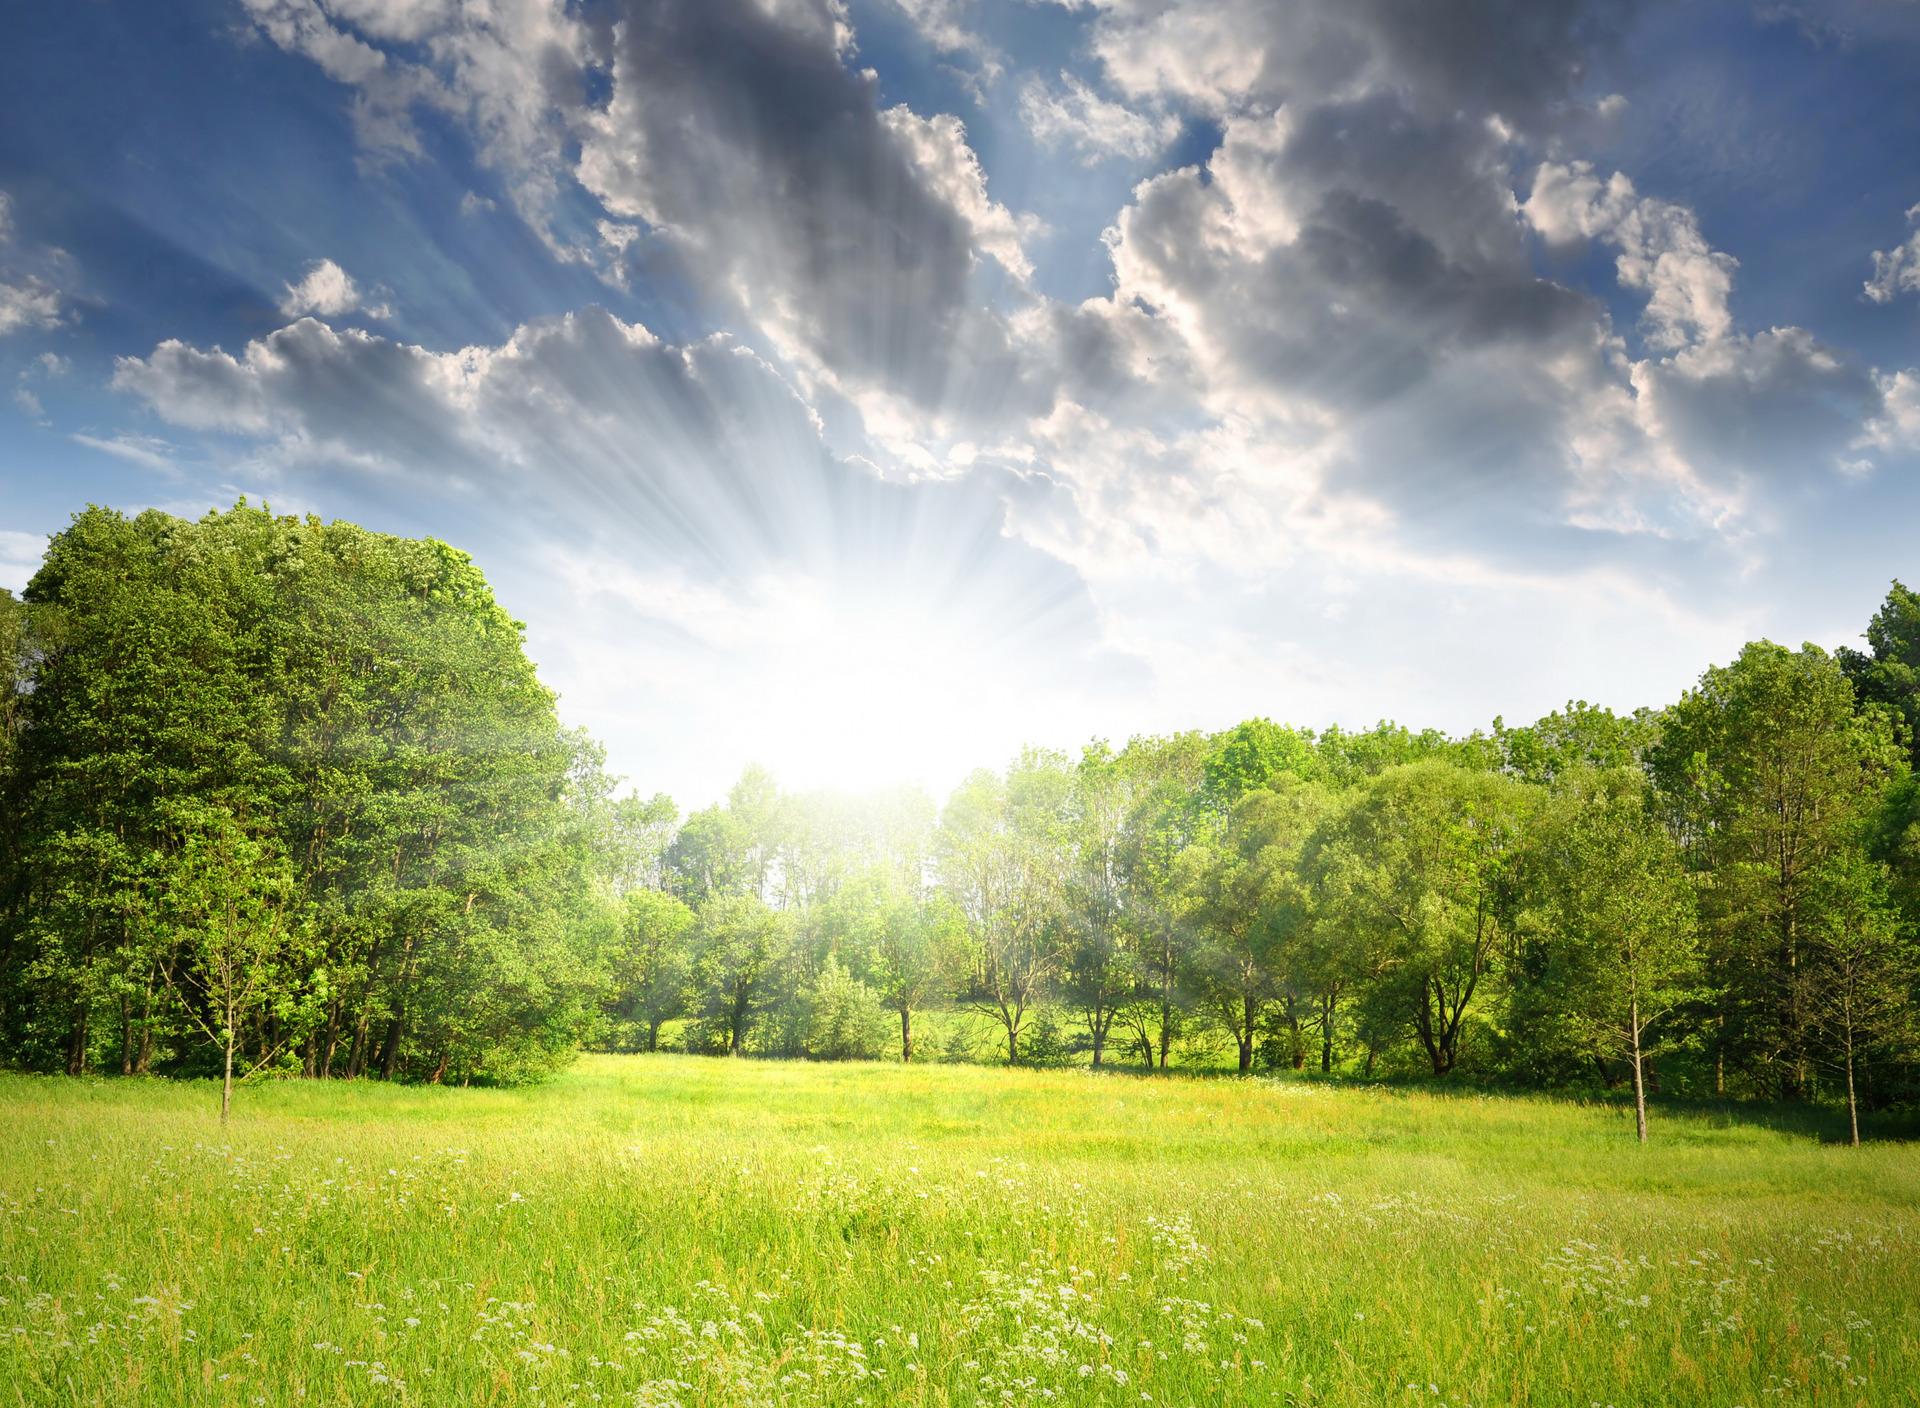 толк солнечный день фото картинки картинка